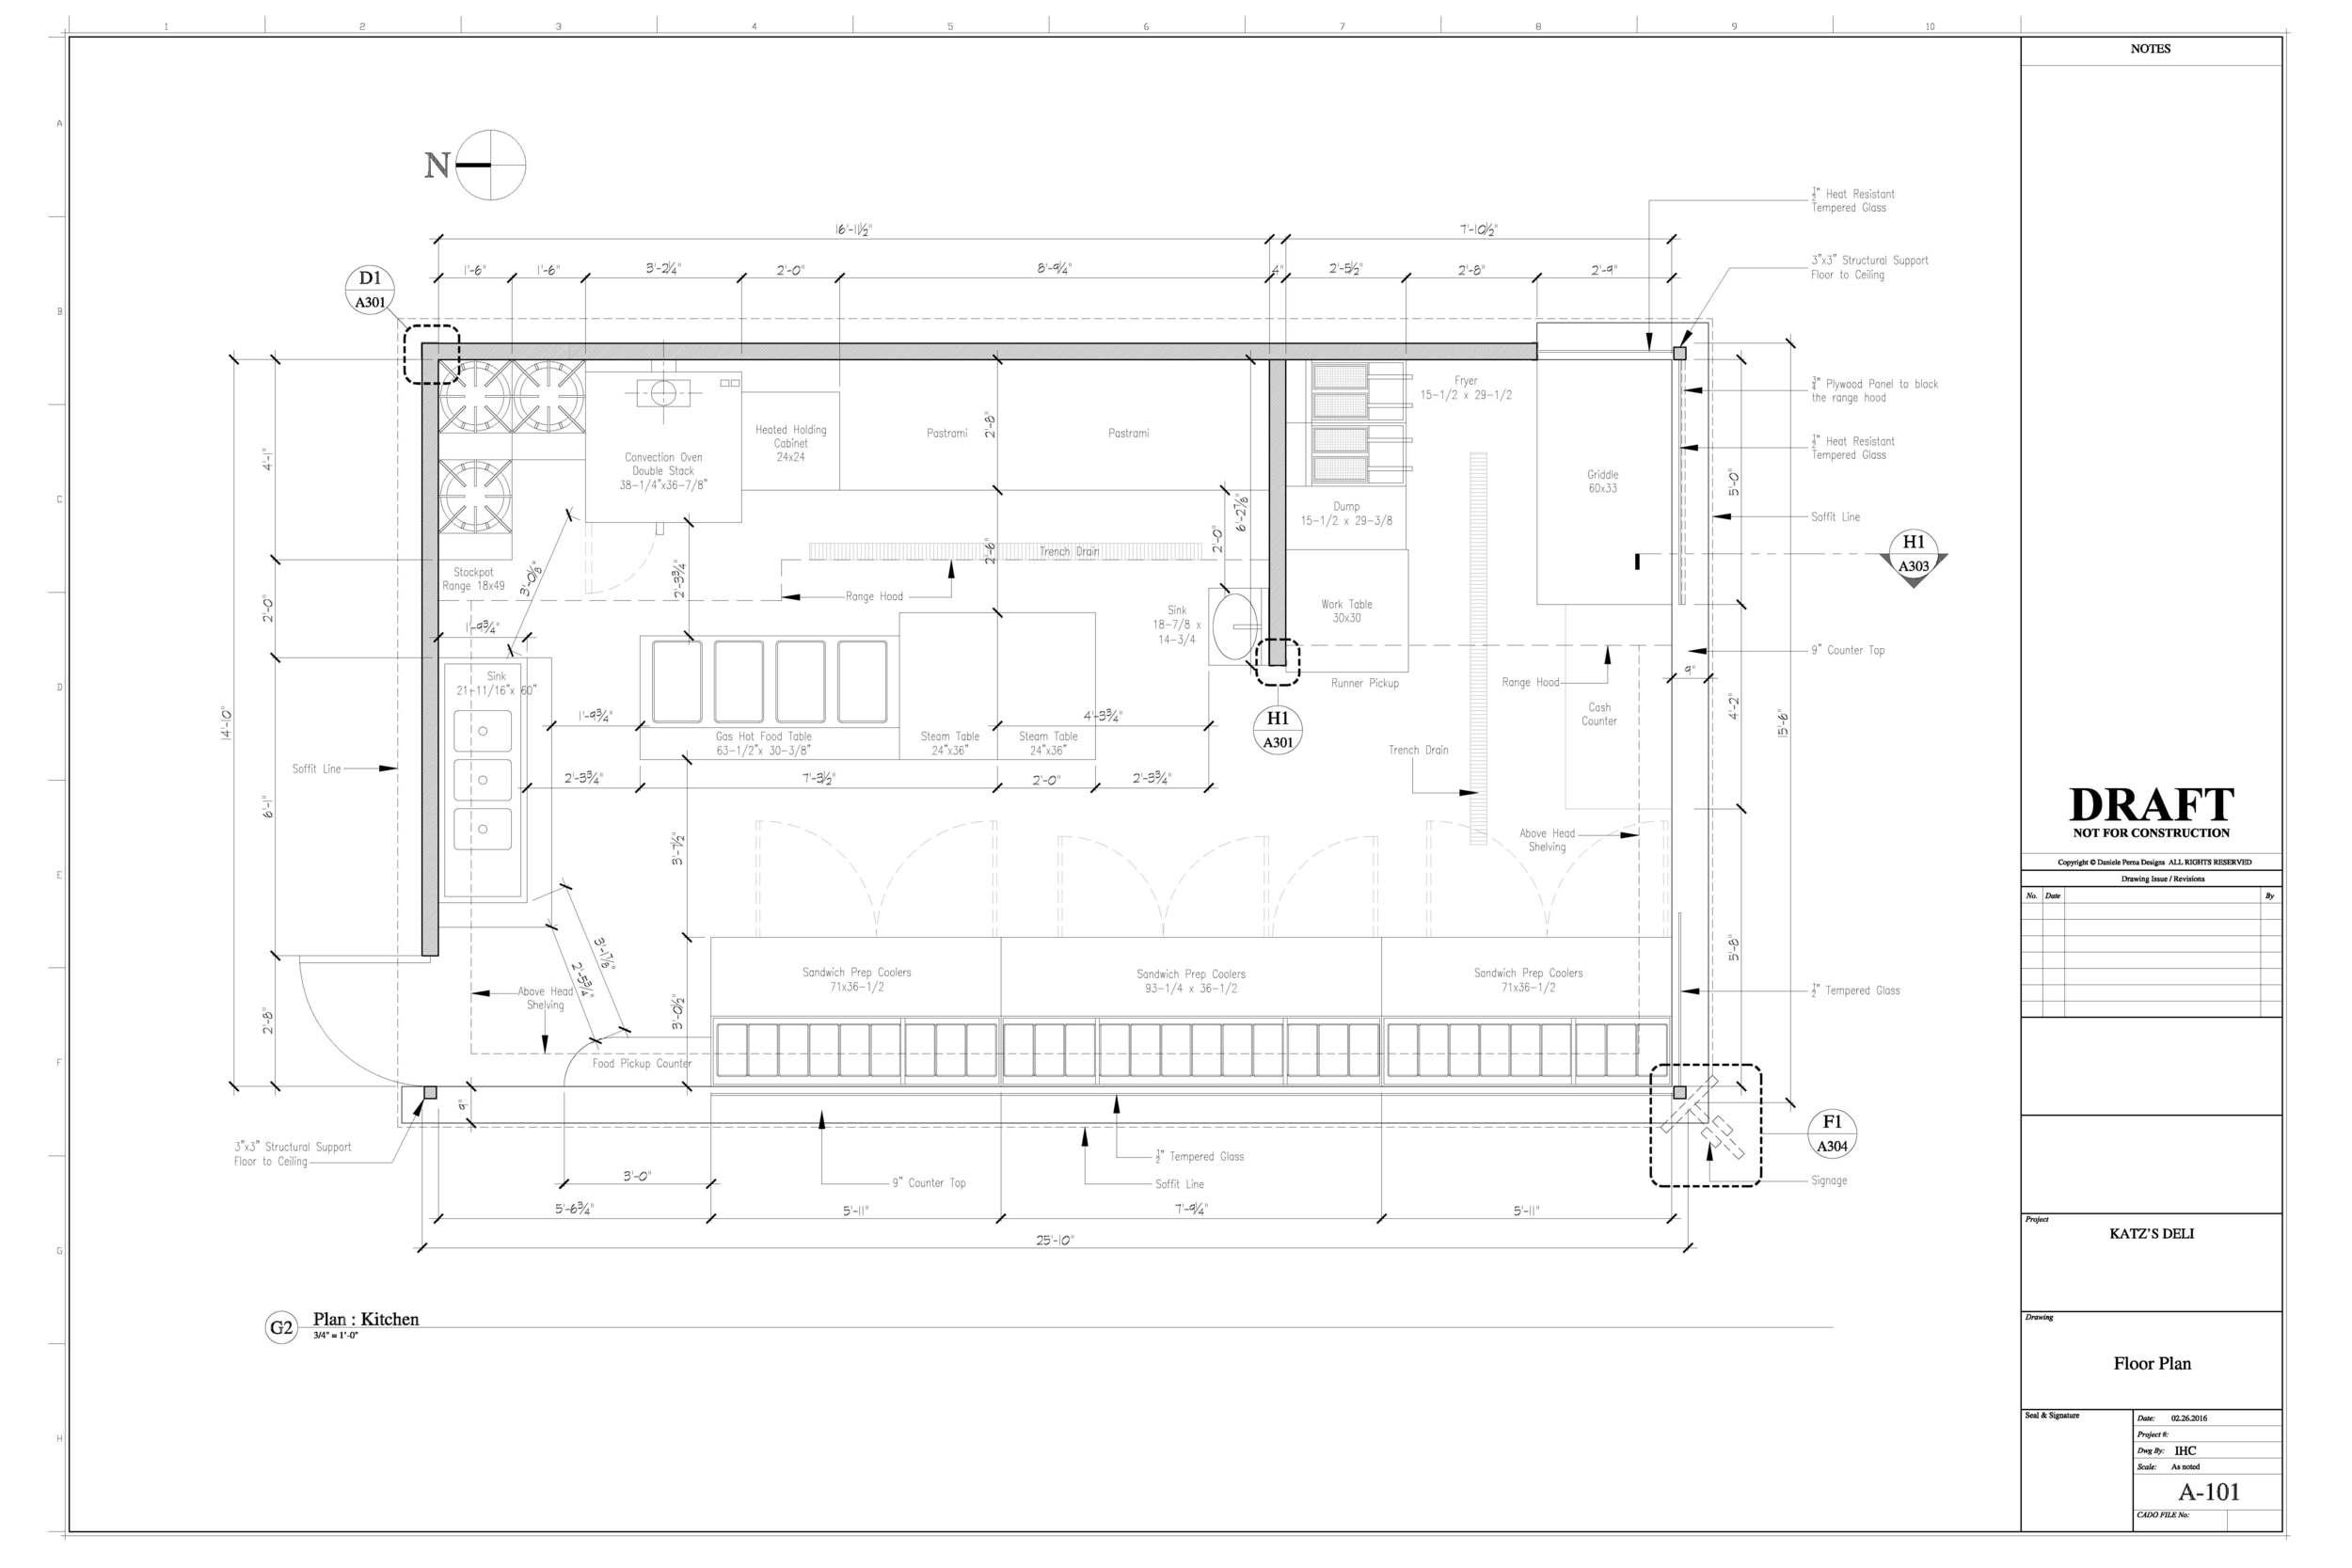 Katz's BK drawing set_Page_01.jpg